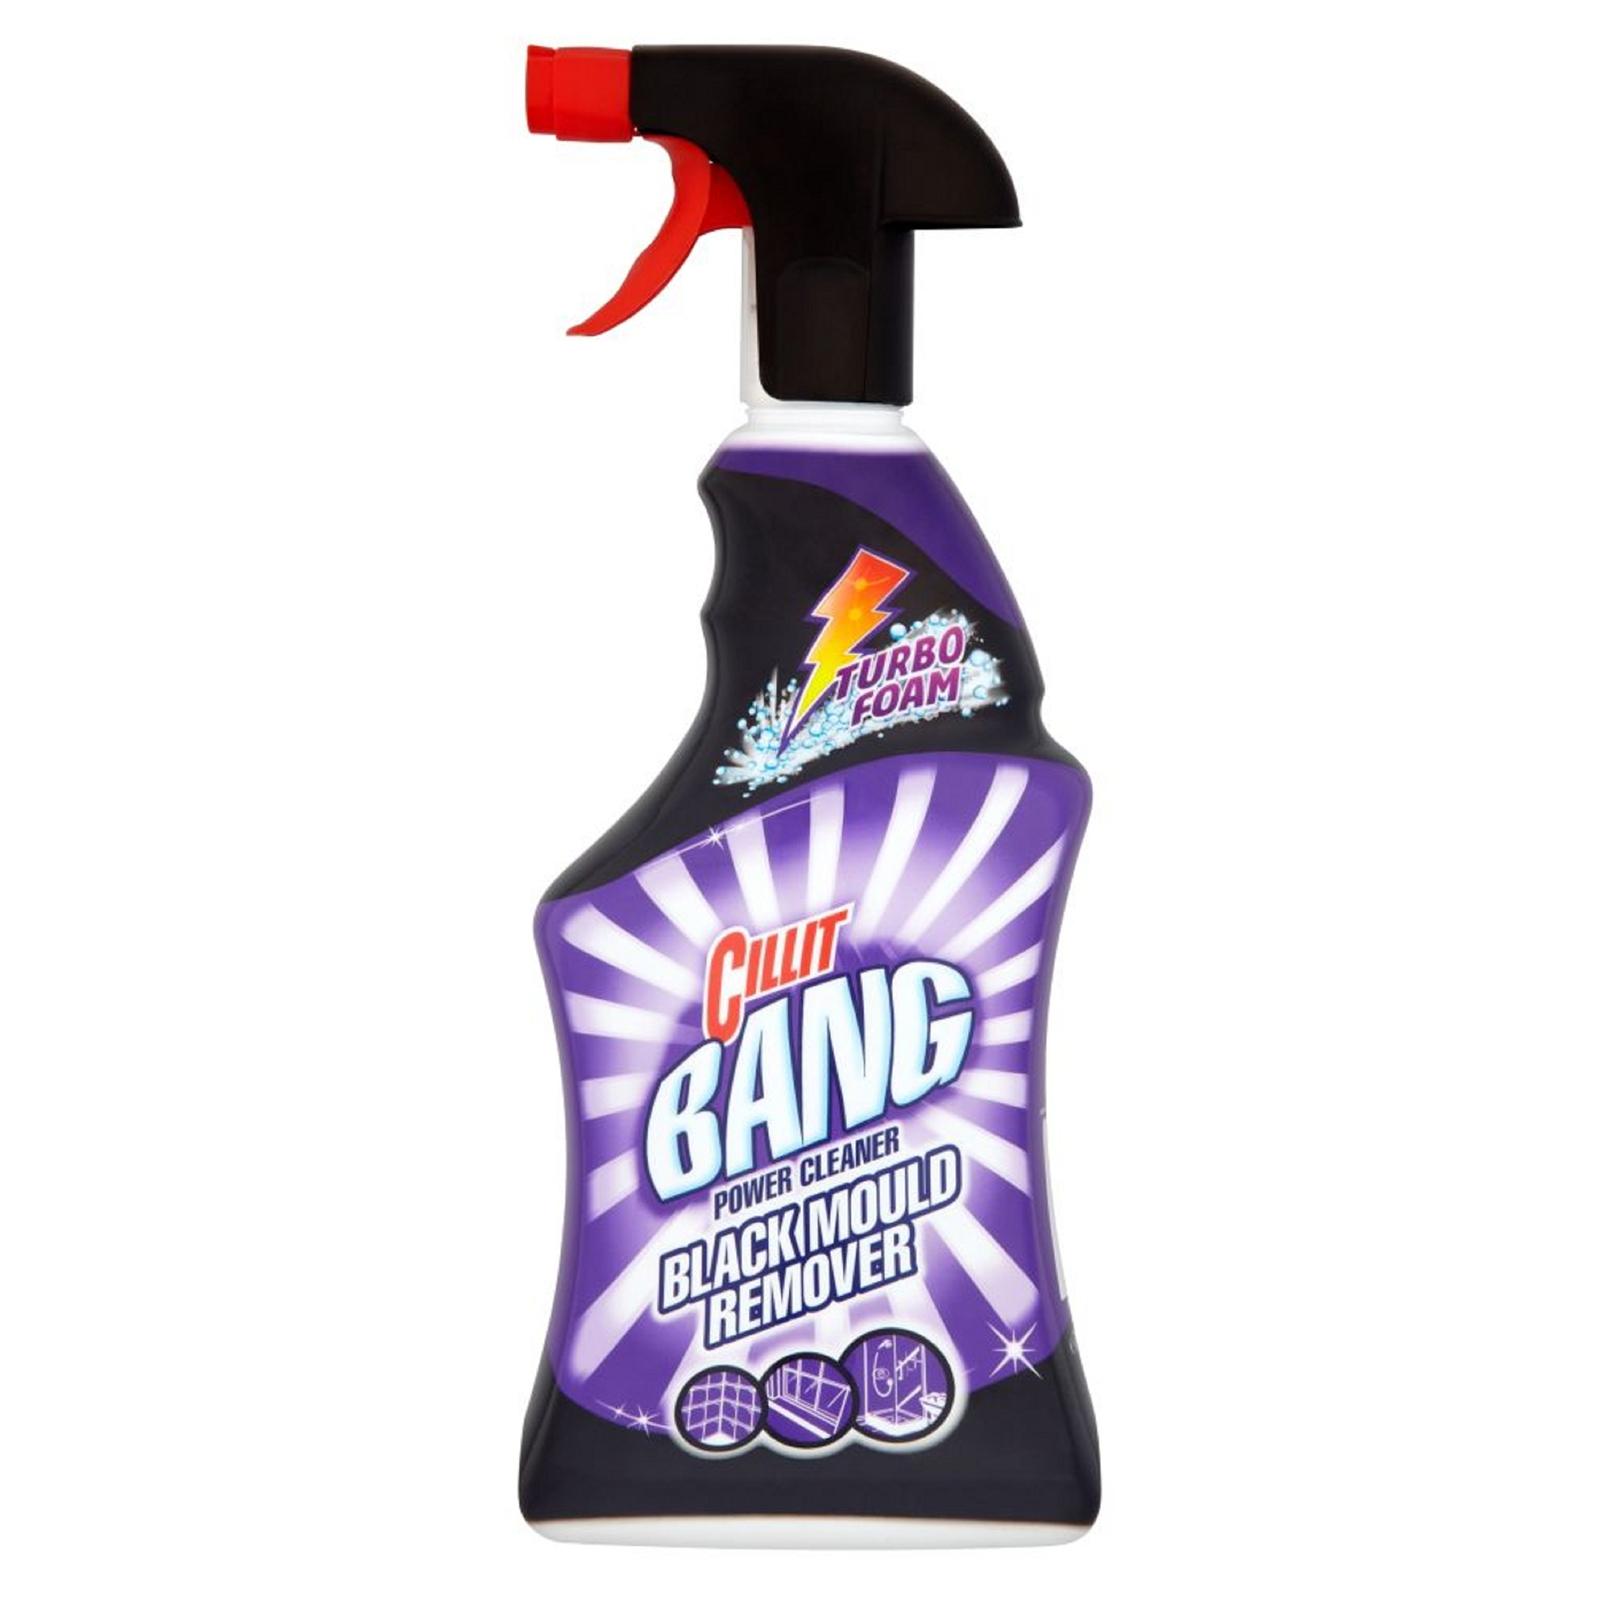 Cillit Bang Power Cleaner Black Mould Remover - 750ml for £1.50 @ Homebase